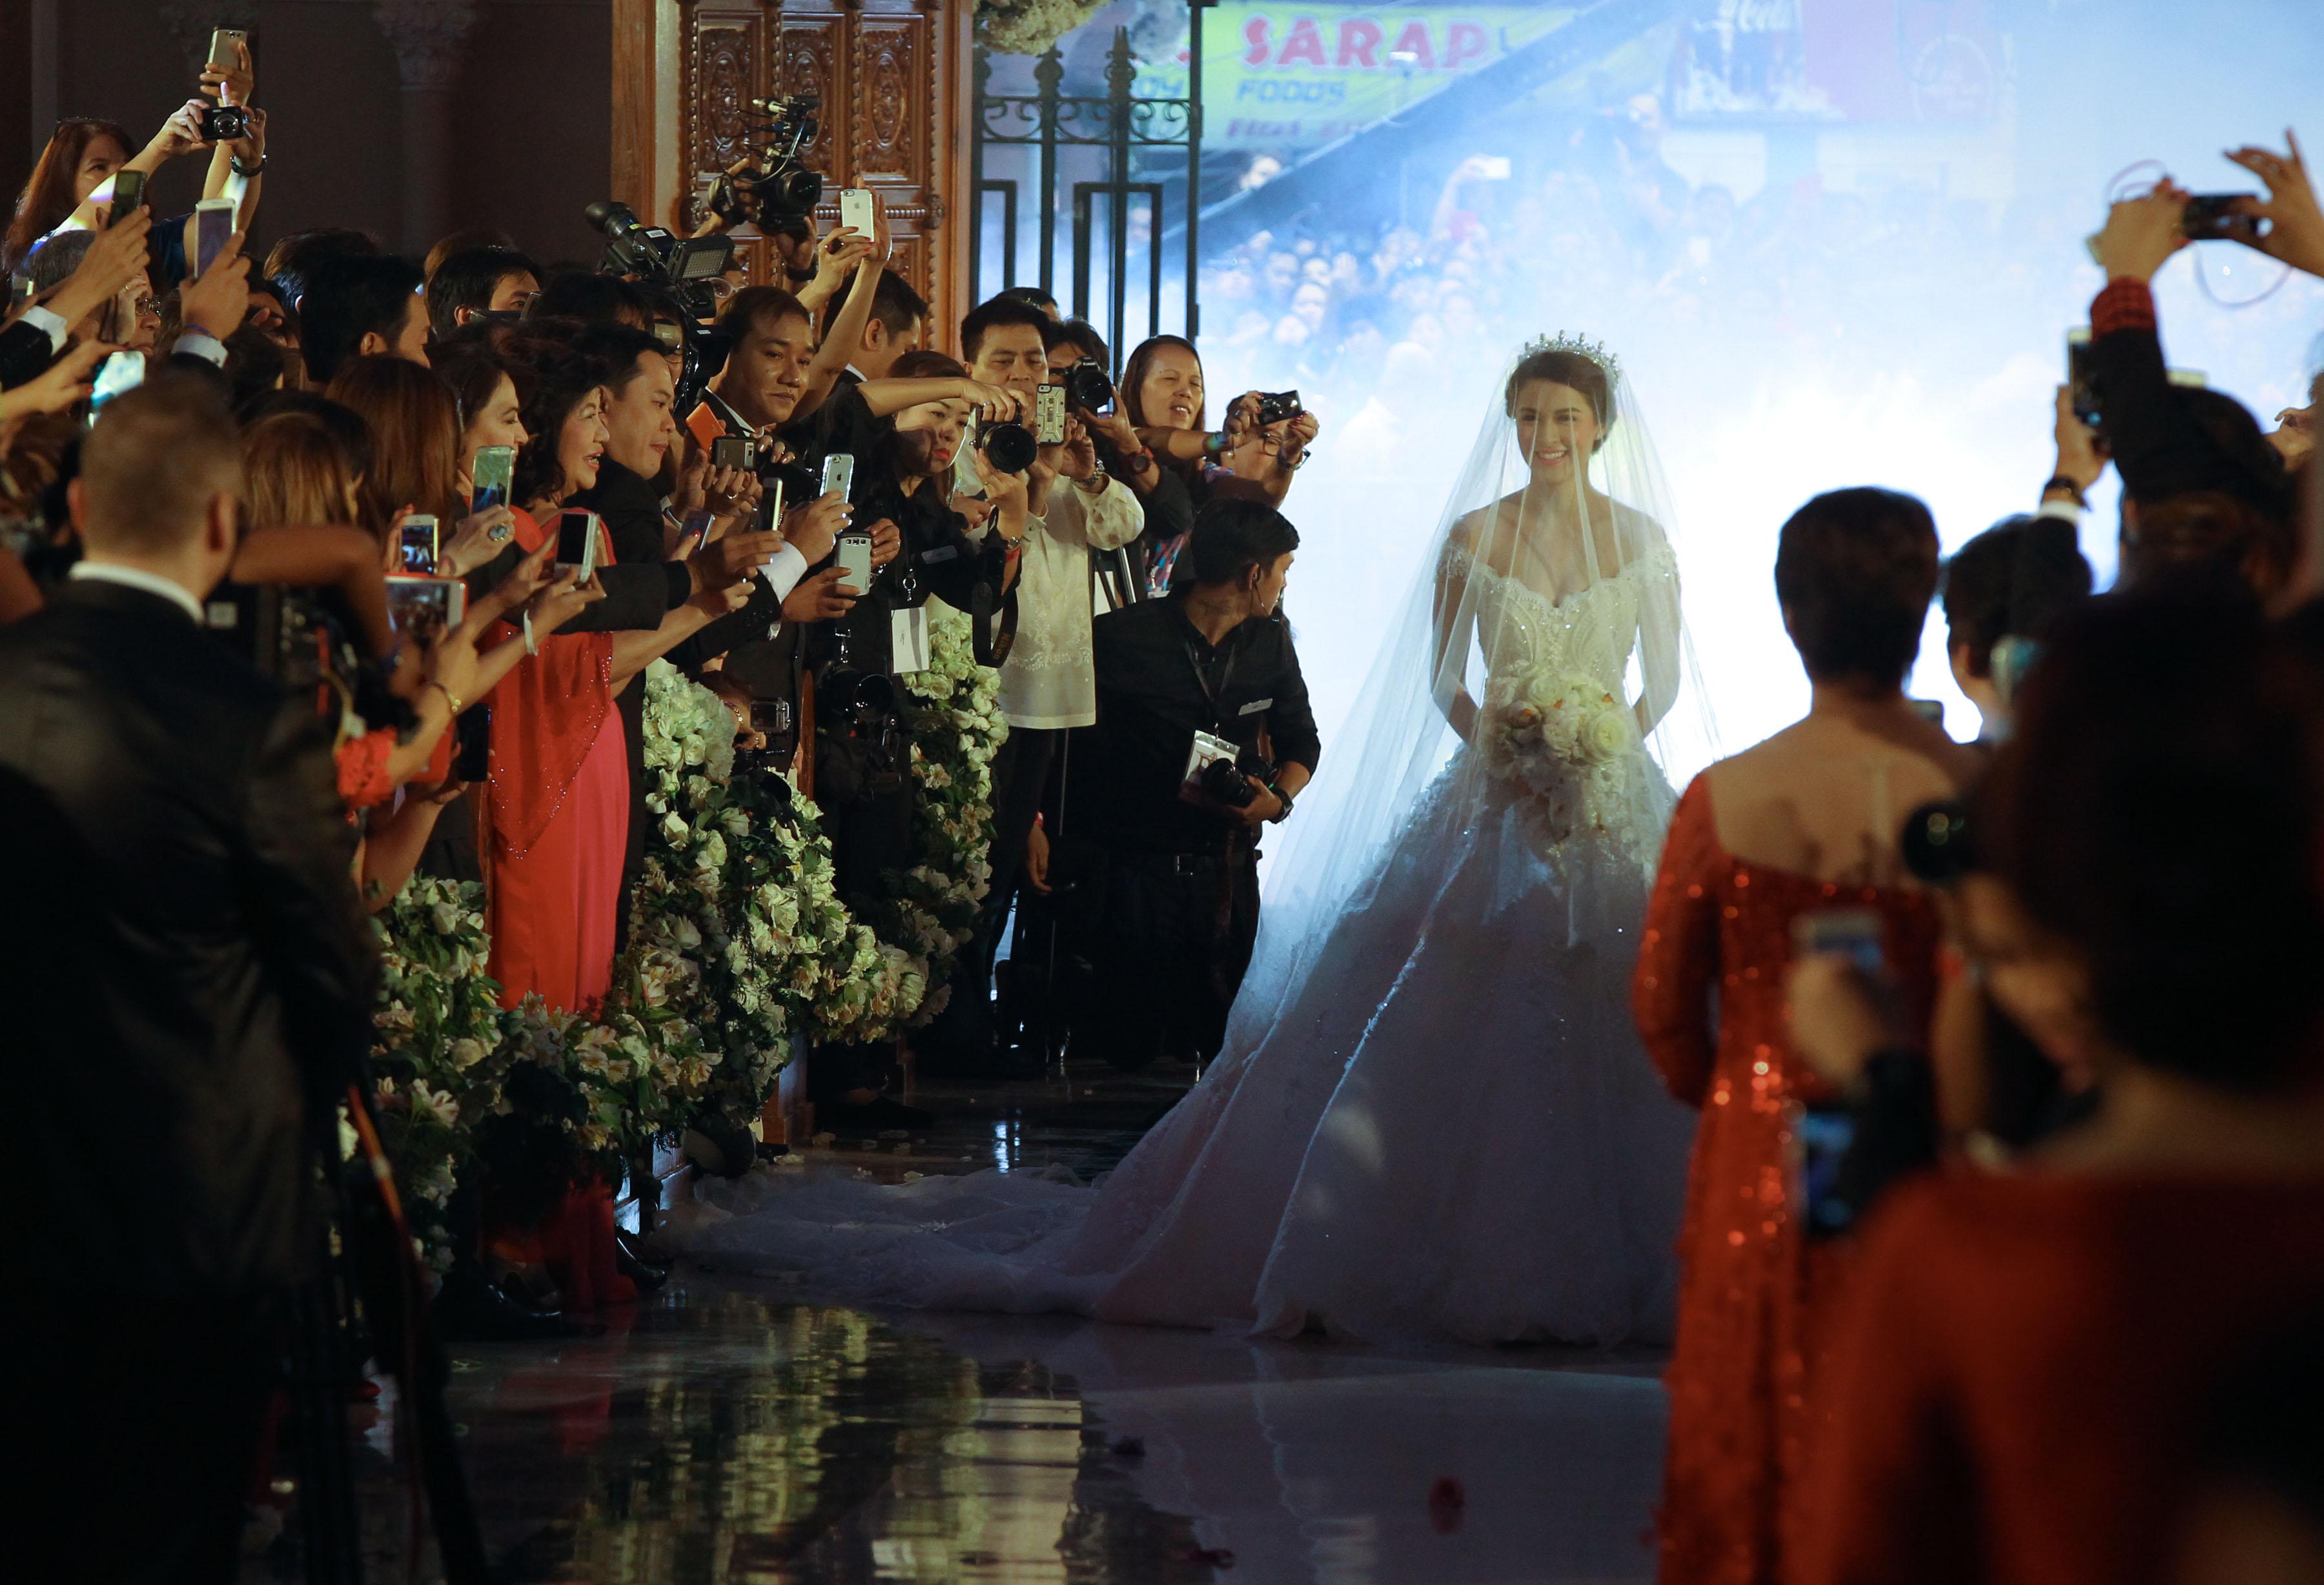 Marian Rivera walks down the aisle.jpg English: Actress Marain Rivera who are tying the knot with longtime boyfriend Actor Dingdong Dantes walks